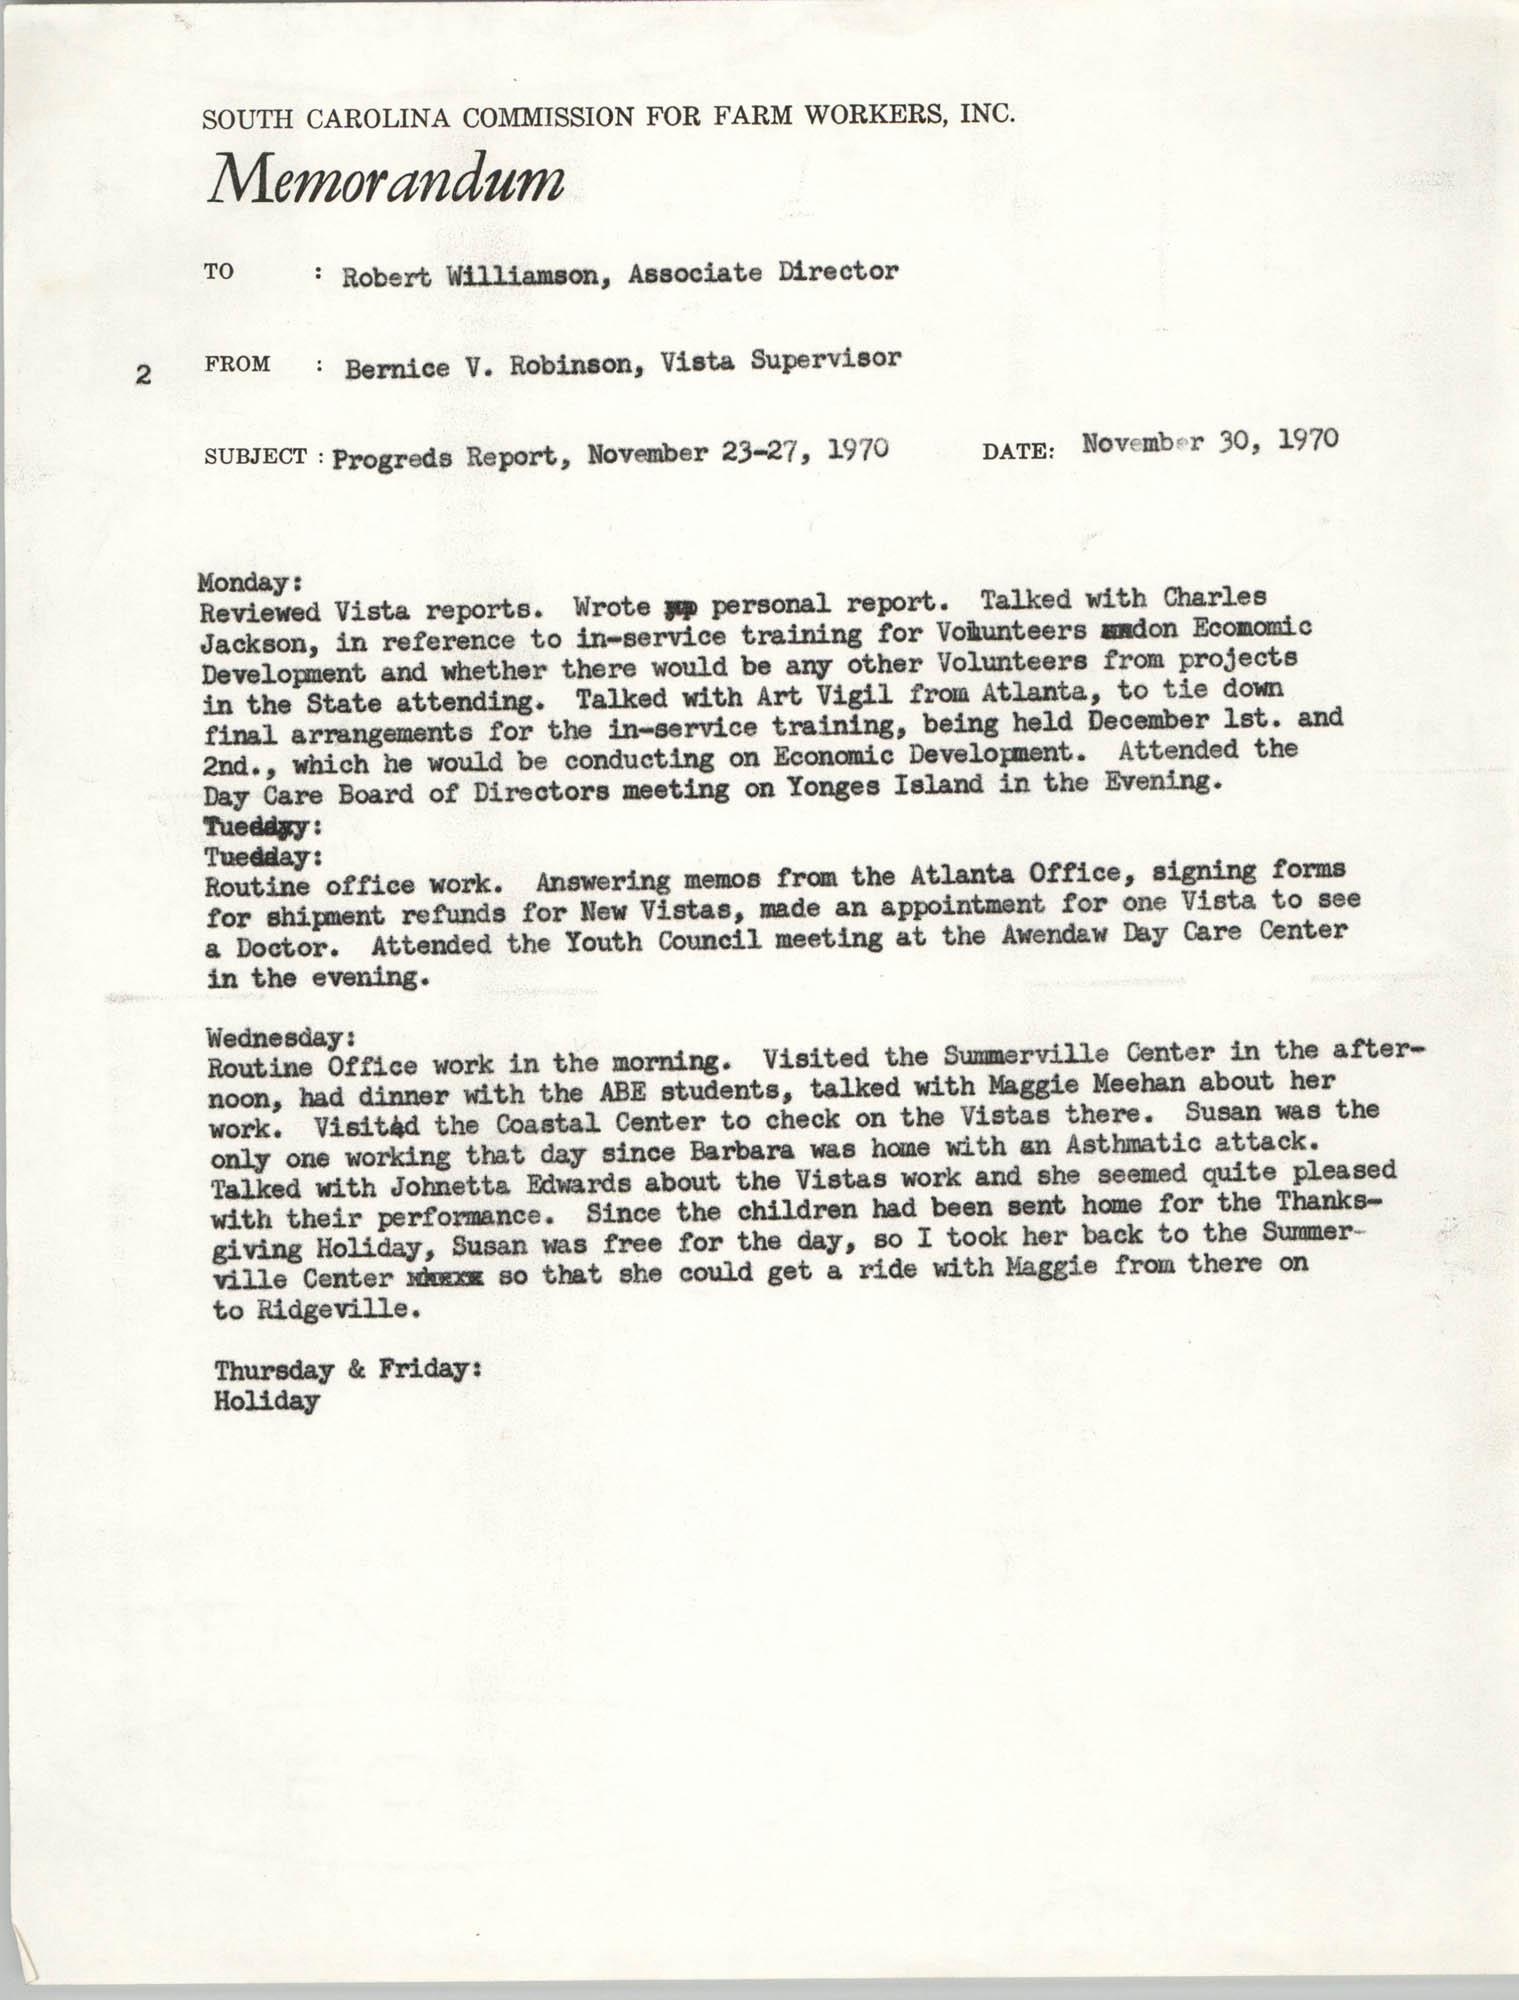 Memorandum from Bernice V. Robinson to Robert Williamson, November 30, 1970